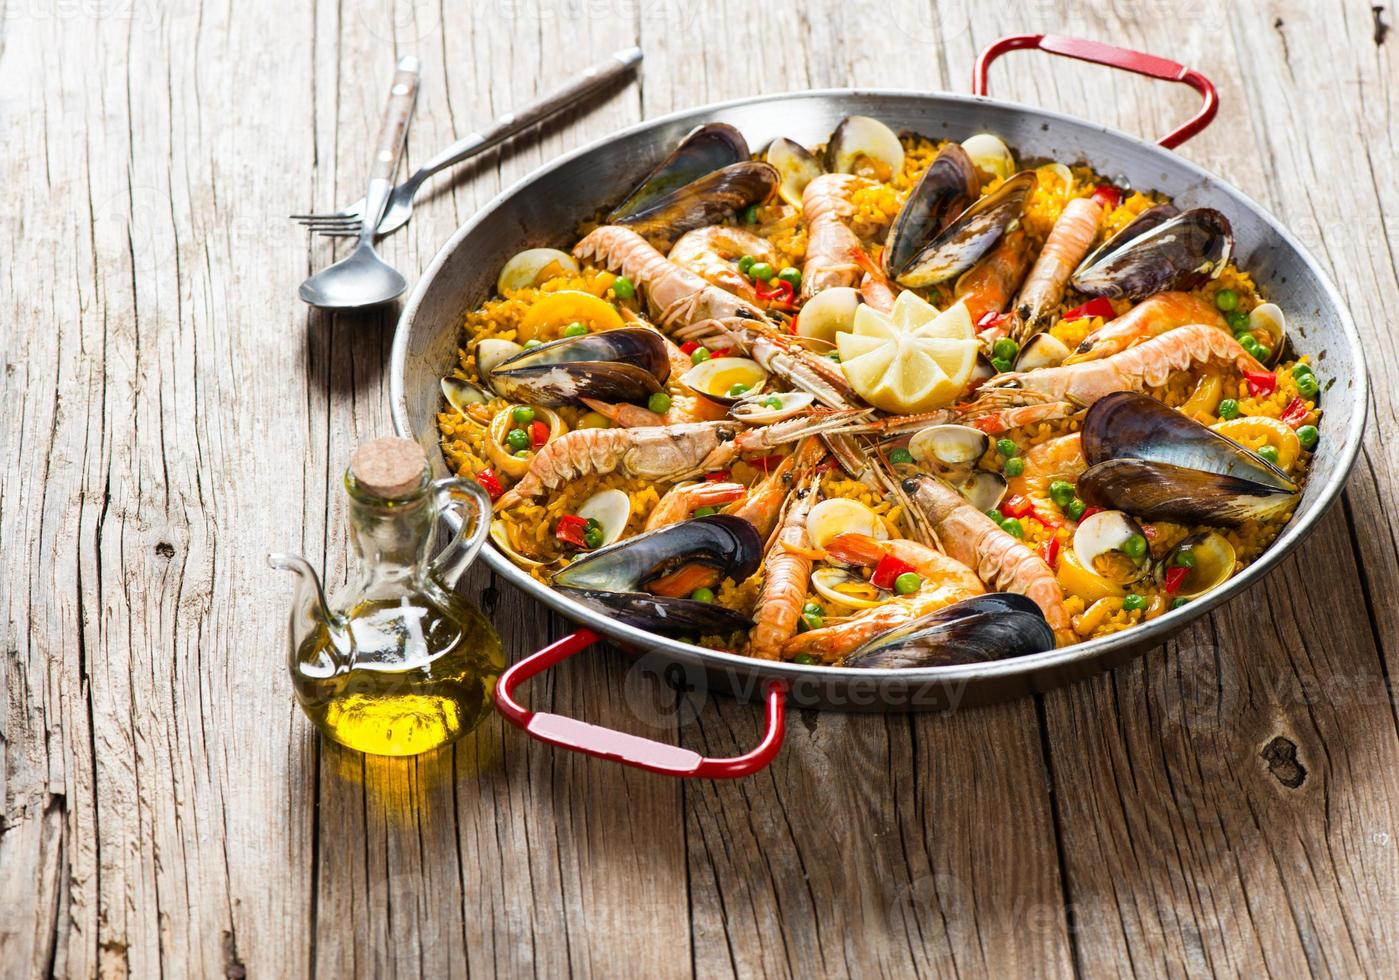 paella de comida tradicional española foto